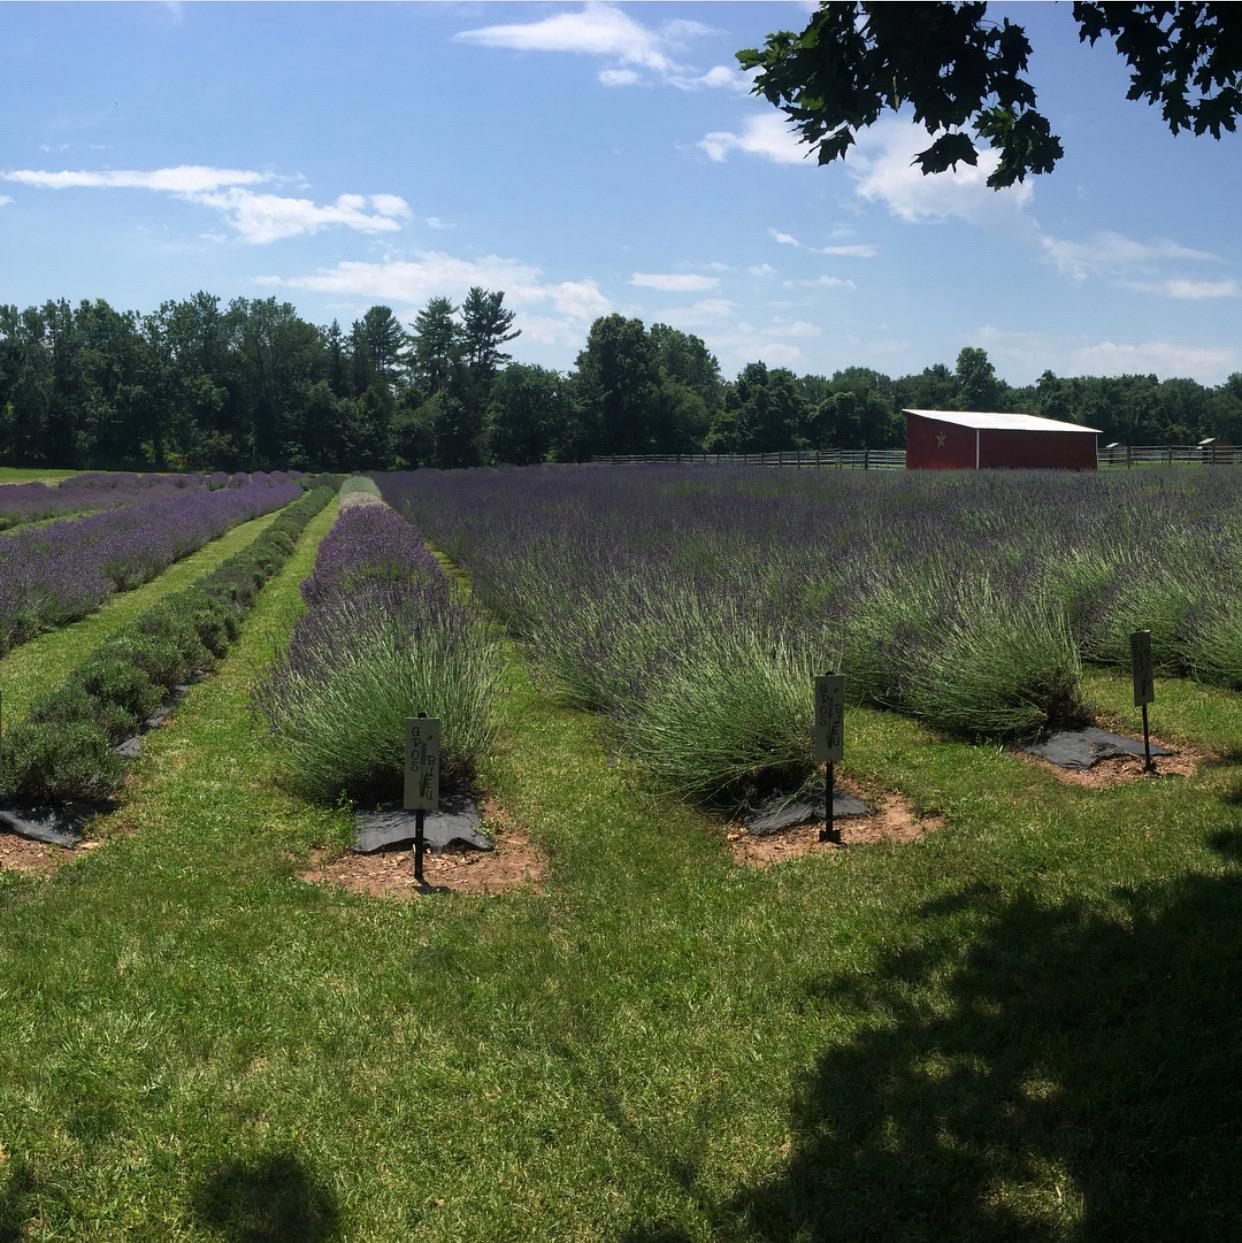 nj mom lavender farm 6 Relaxing Lavender Farms in New Jersey lavender fields nj hiddenspringlavender